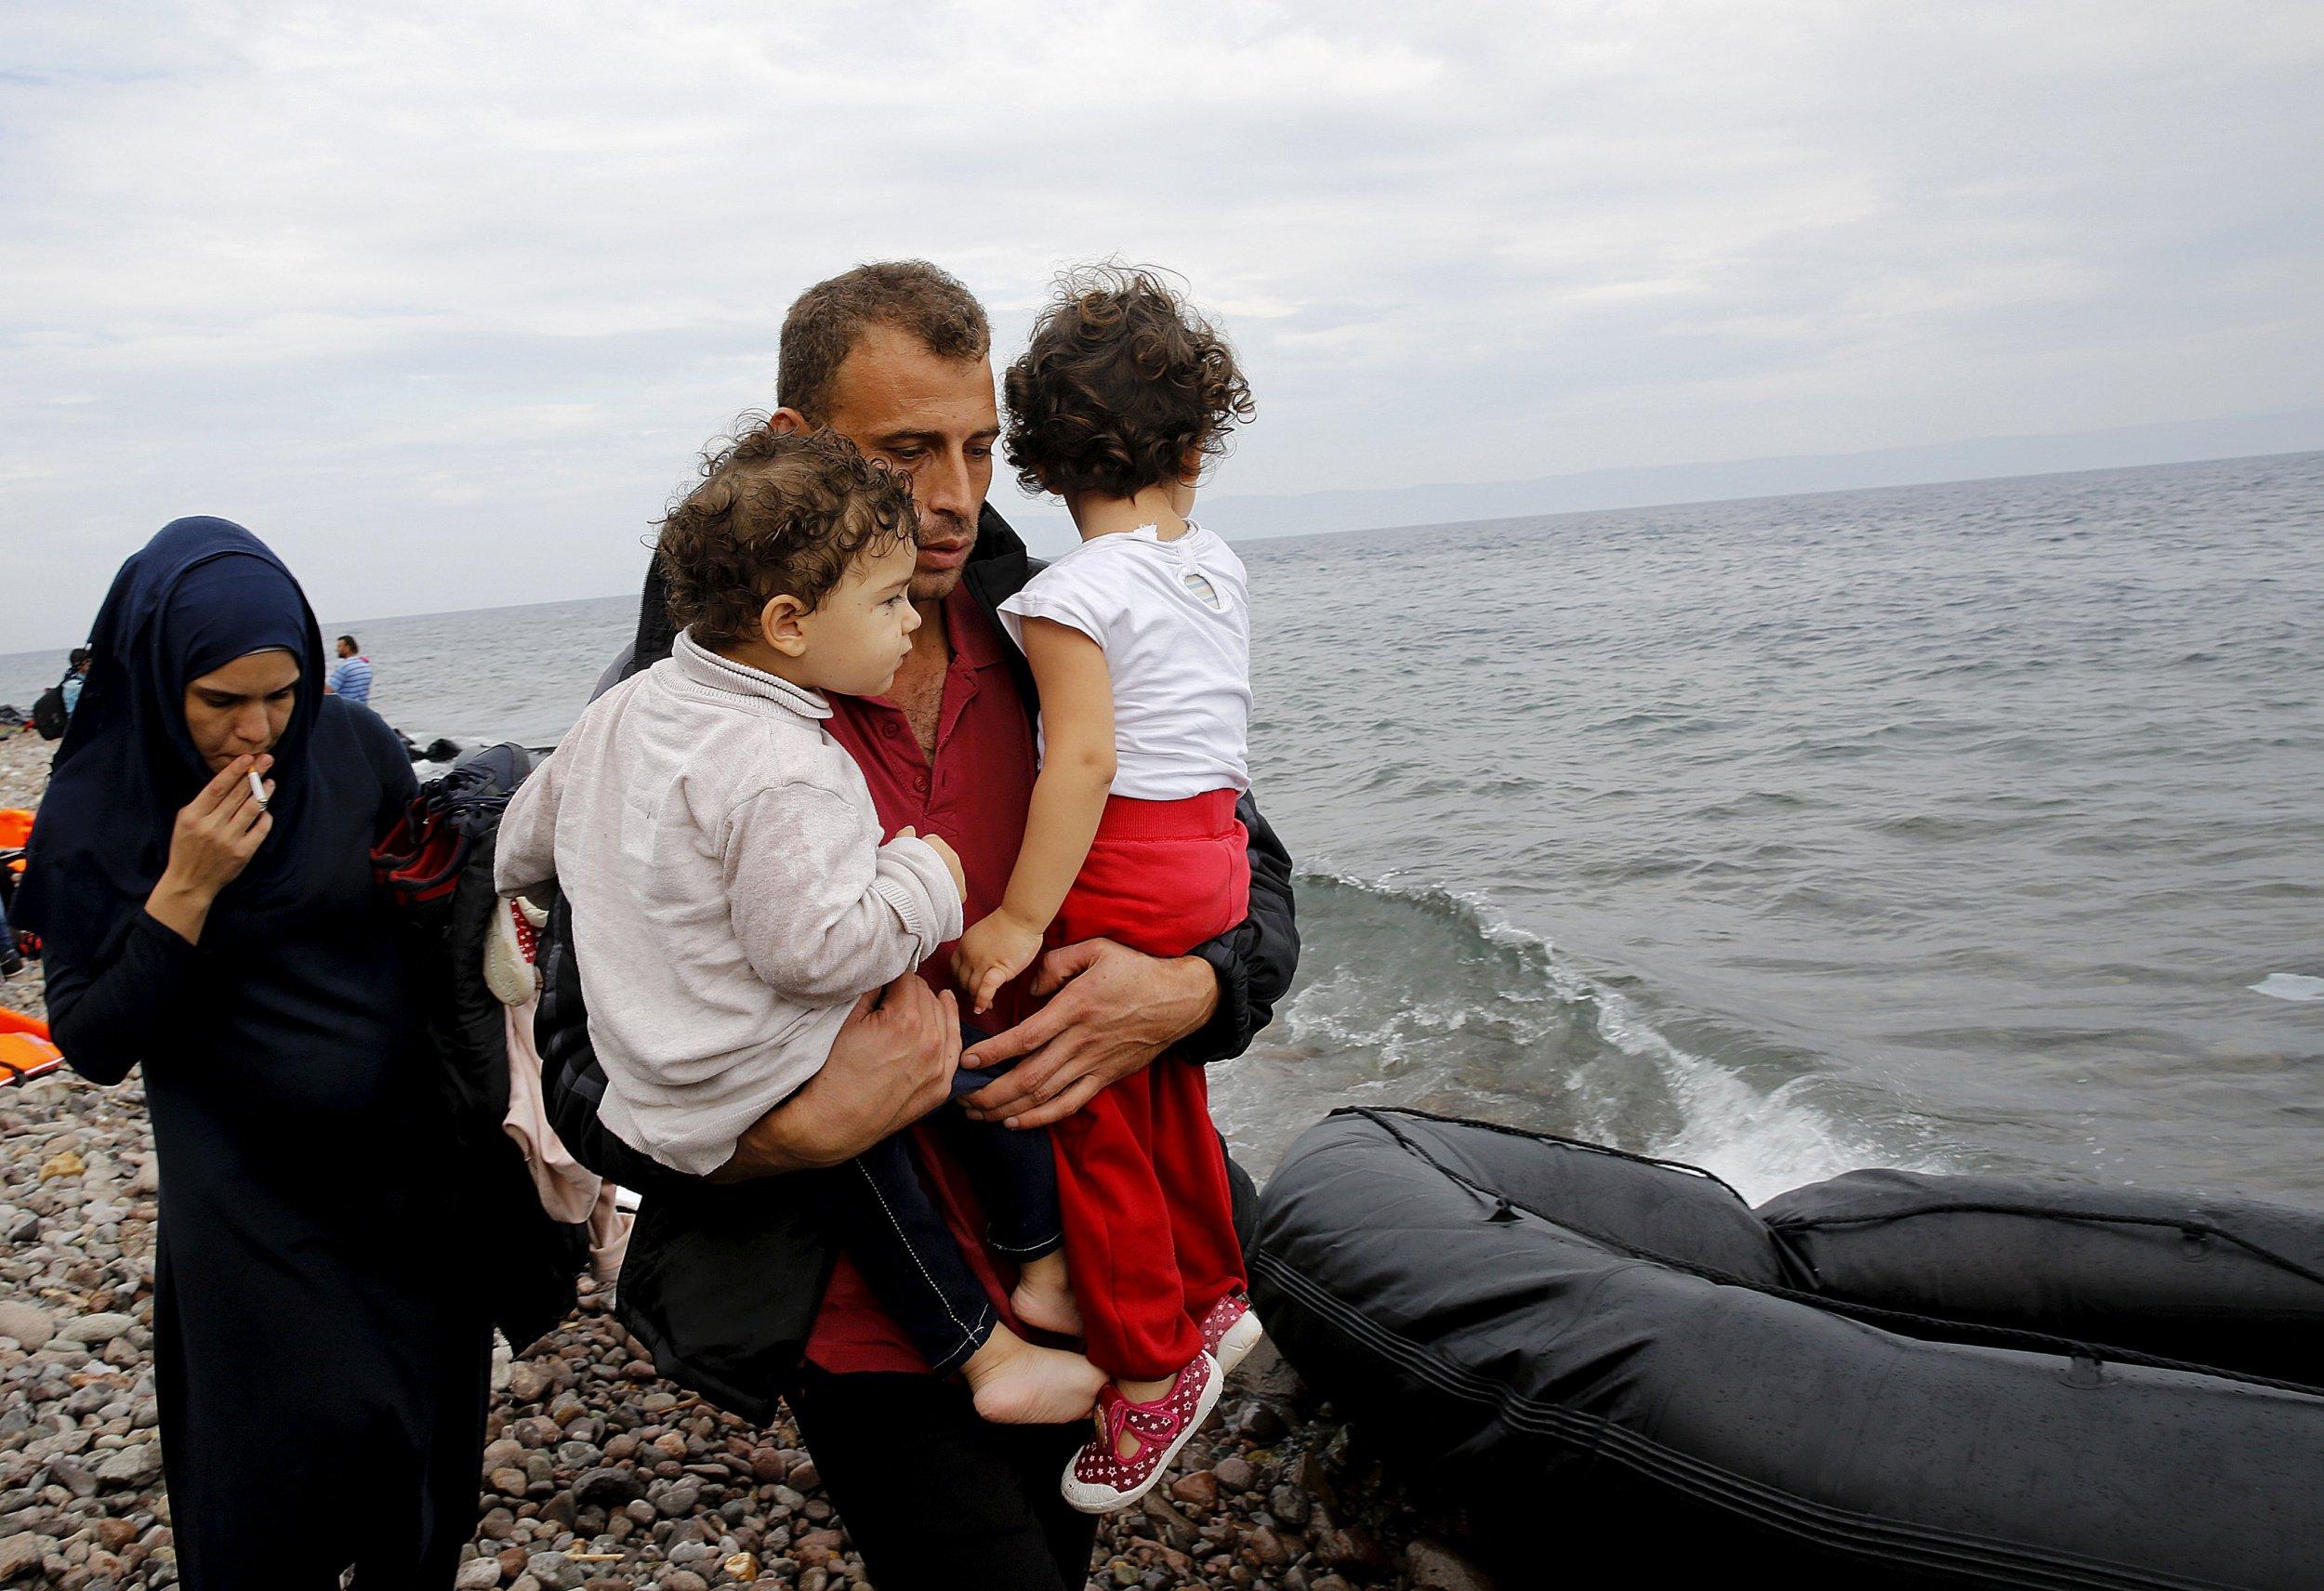 09_22_Refugees_01